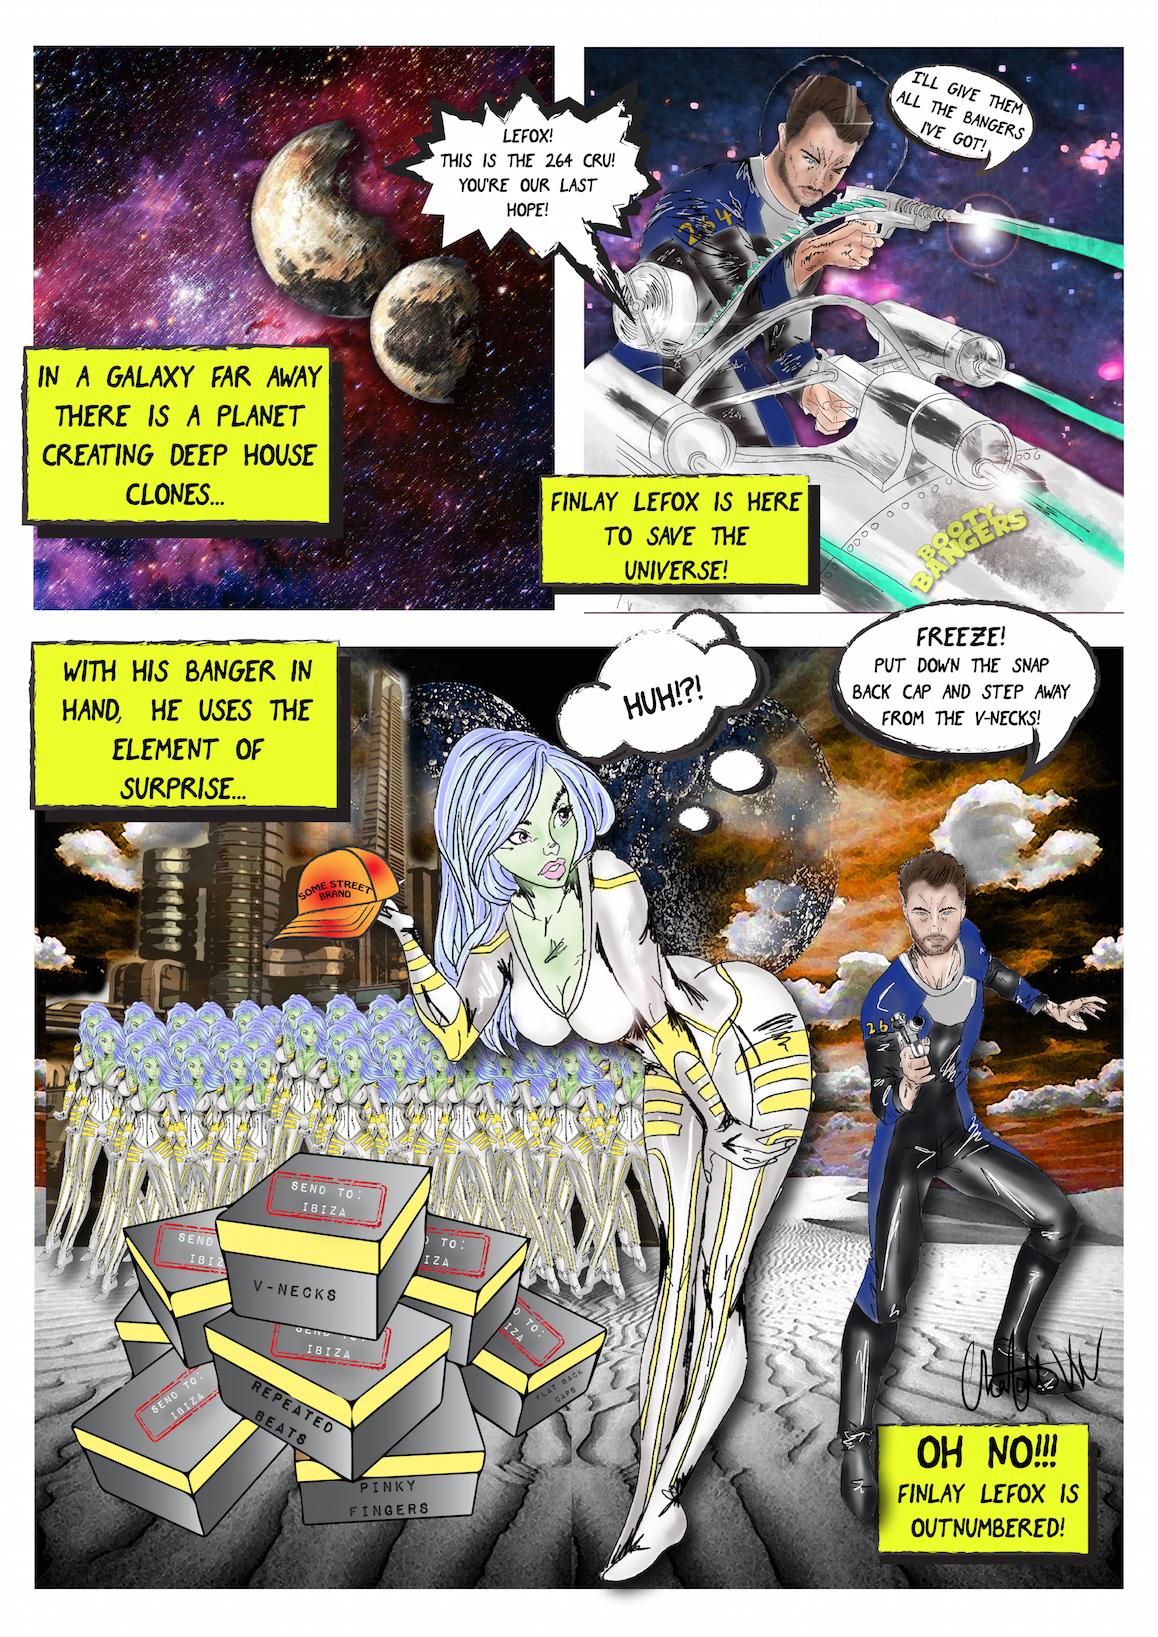 BOOTY BANGERS VOL 1 MARTIAN LEFOX - Page 2.jpg